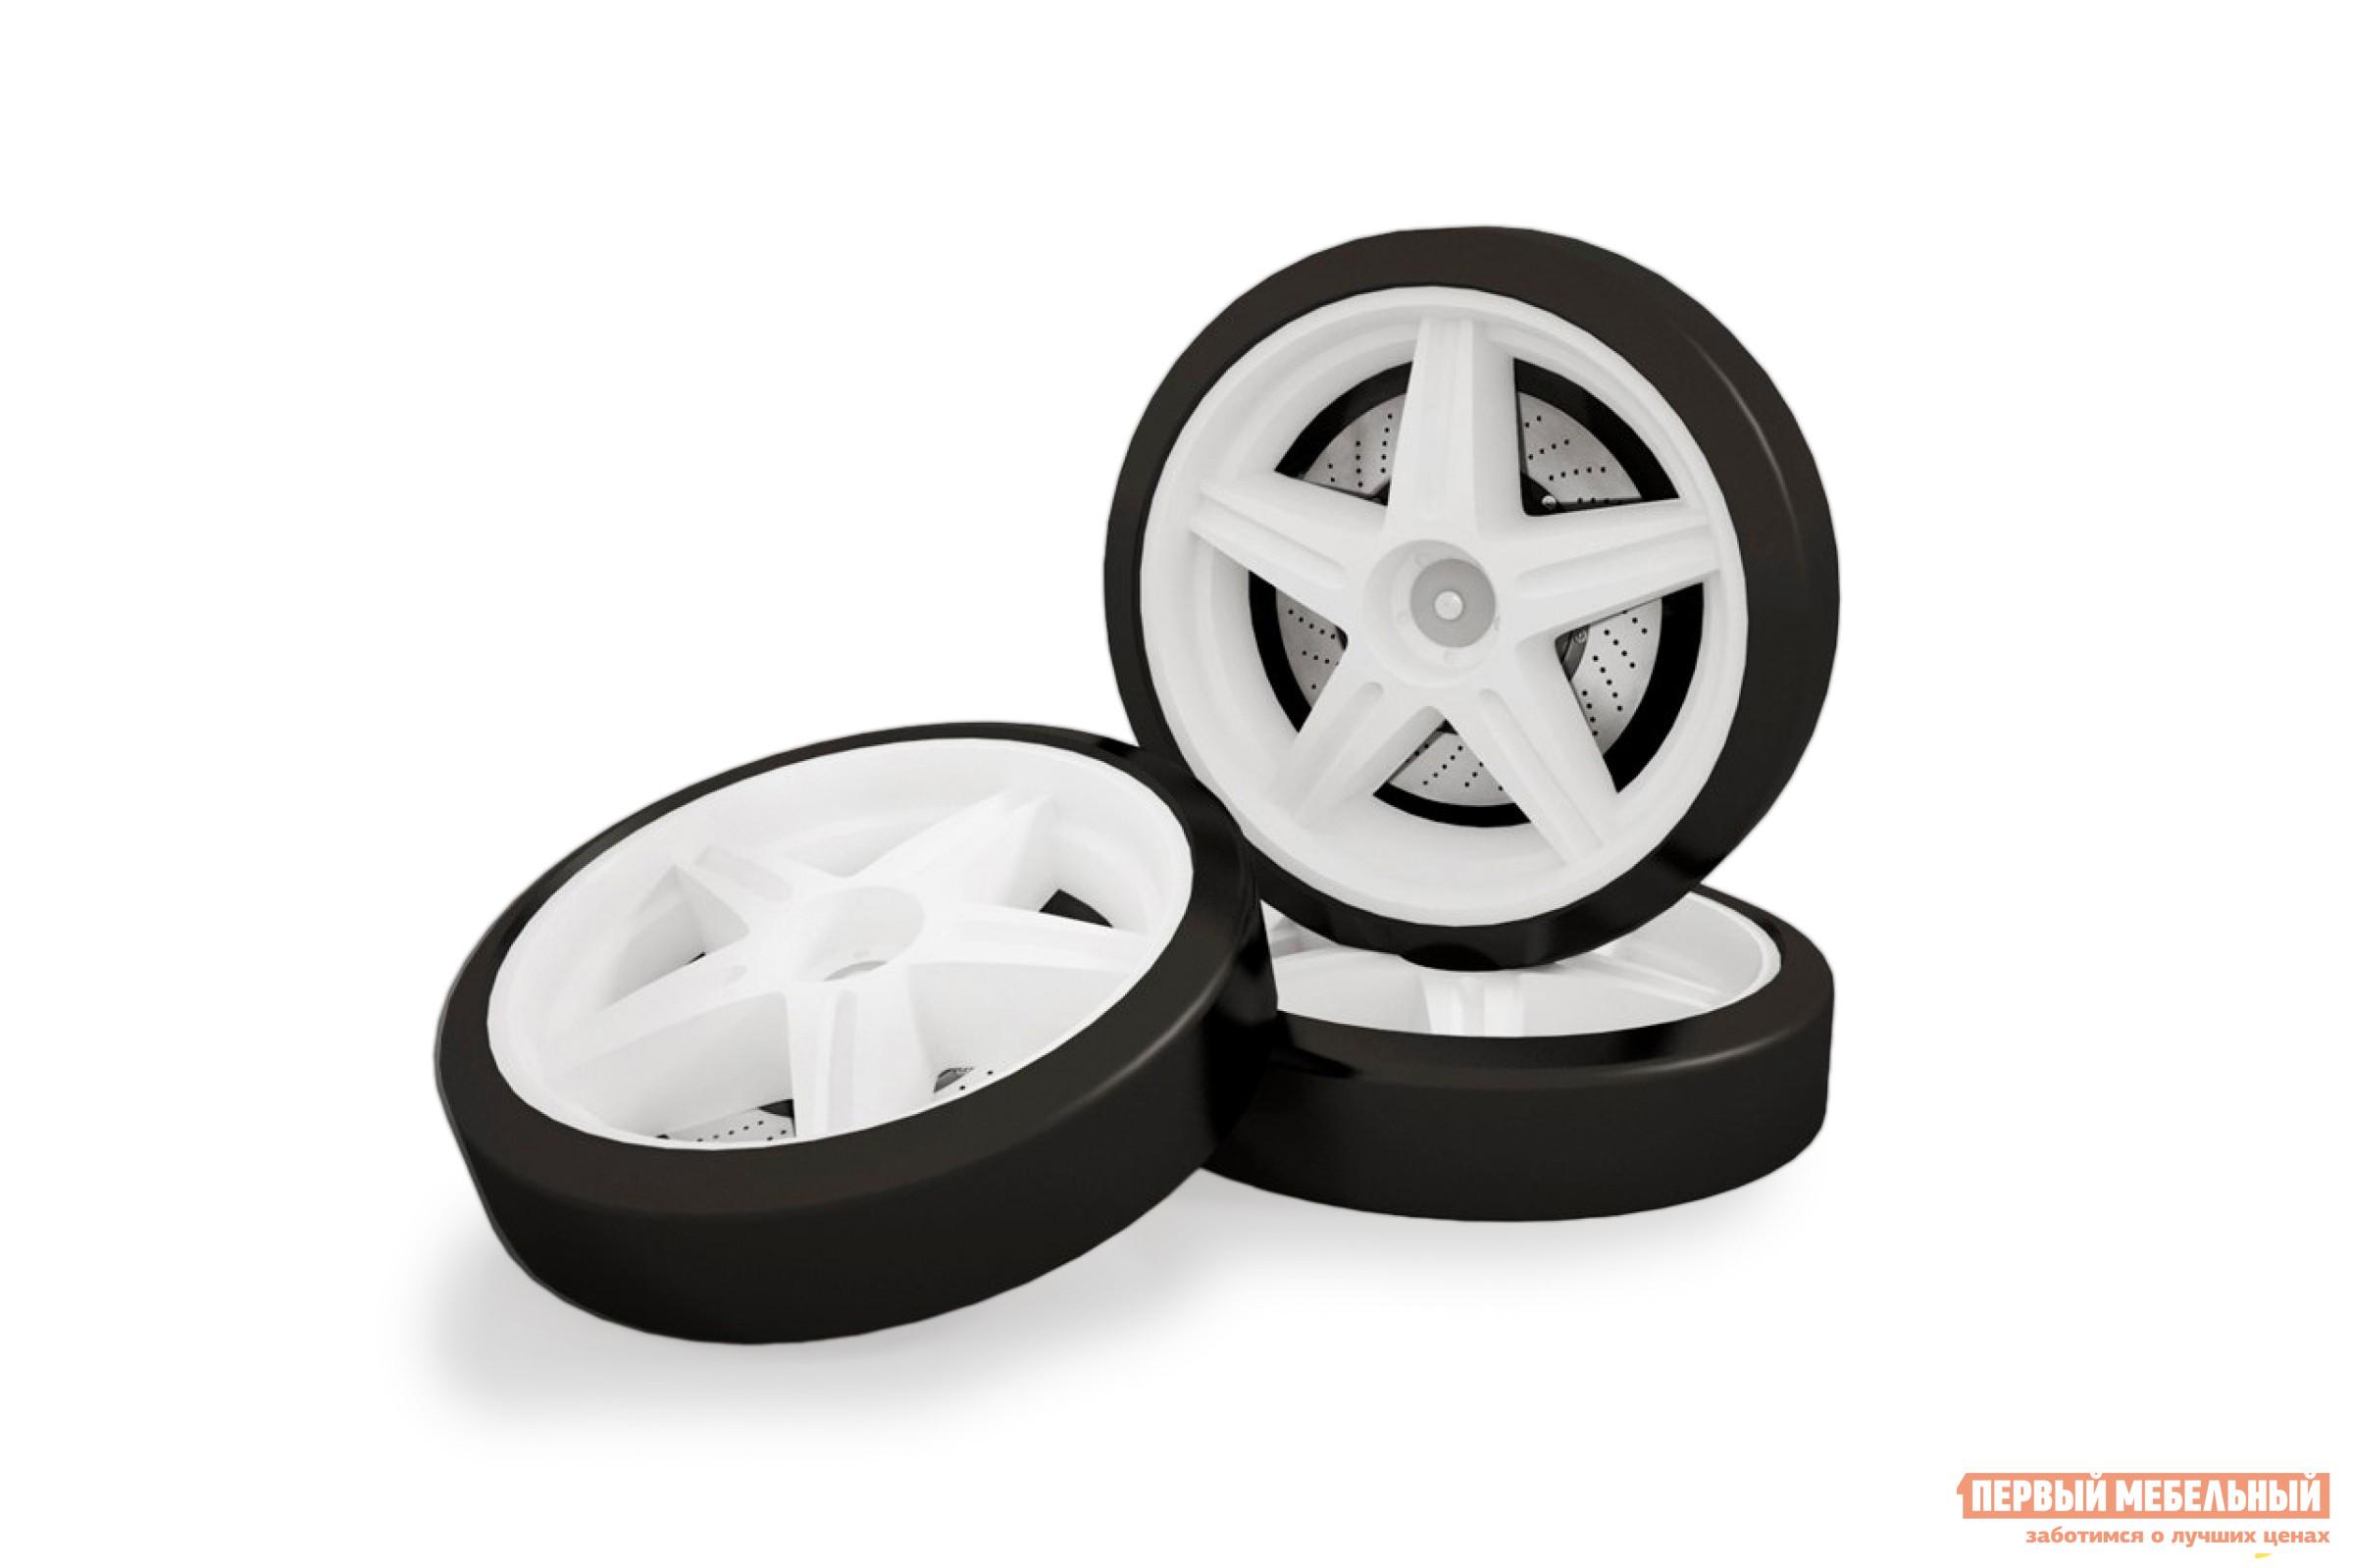 Аксессуар Bed-mobile Накладные колеса с дисками для БМ/Мерседес/Мозерати, Ауди А6, 2 шт